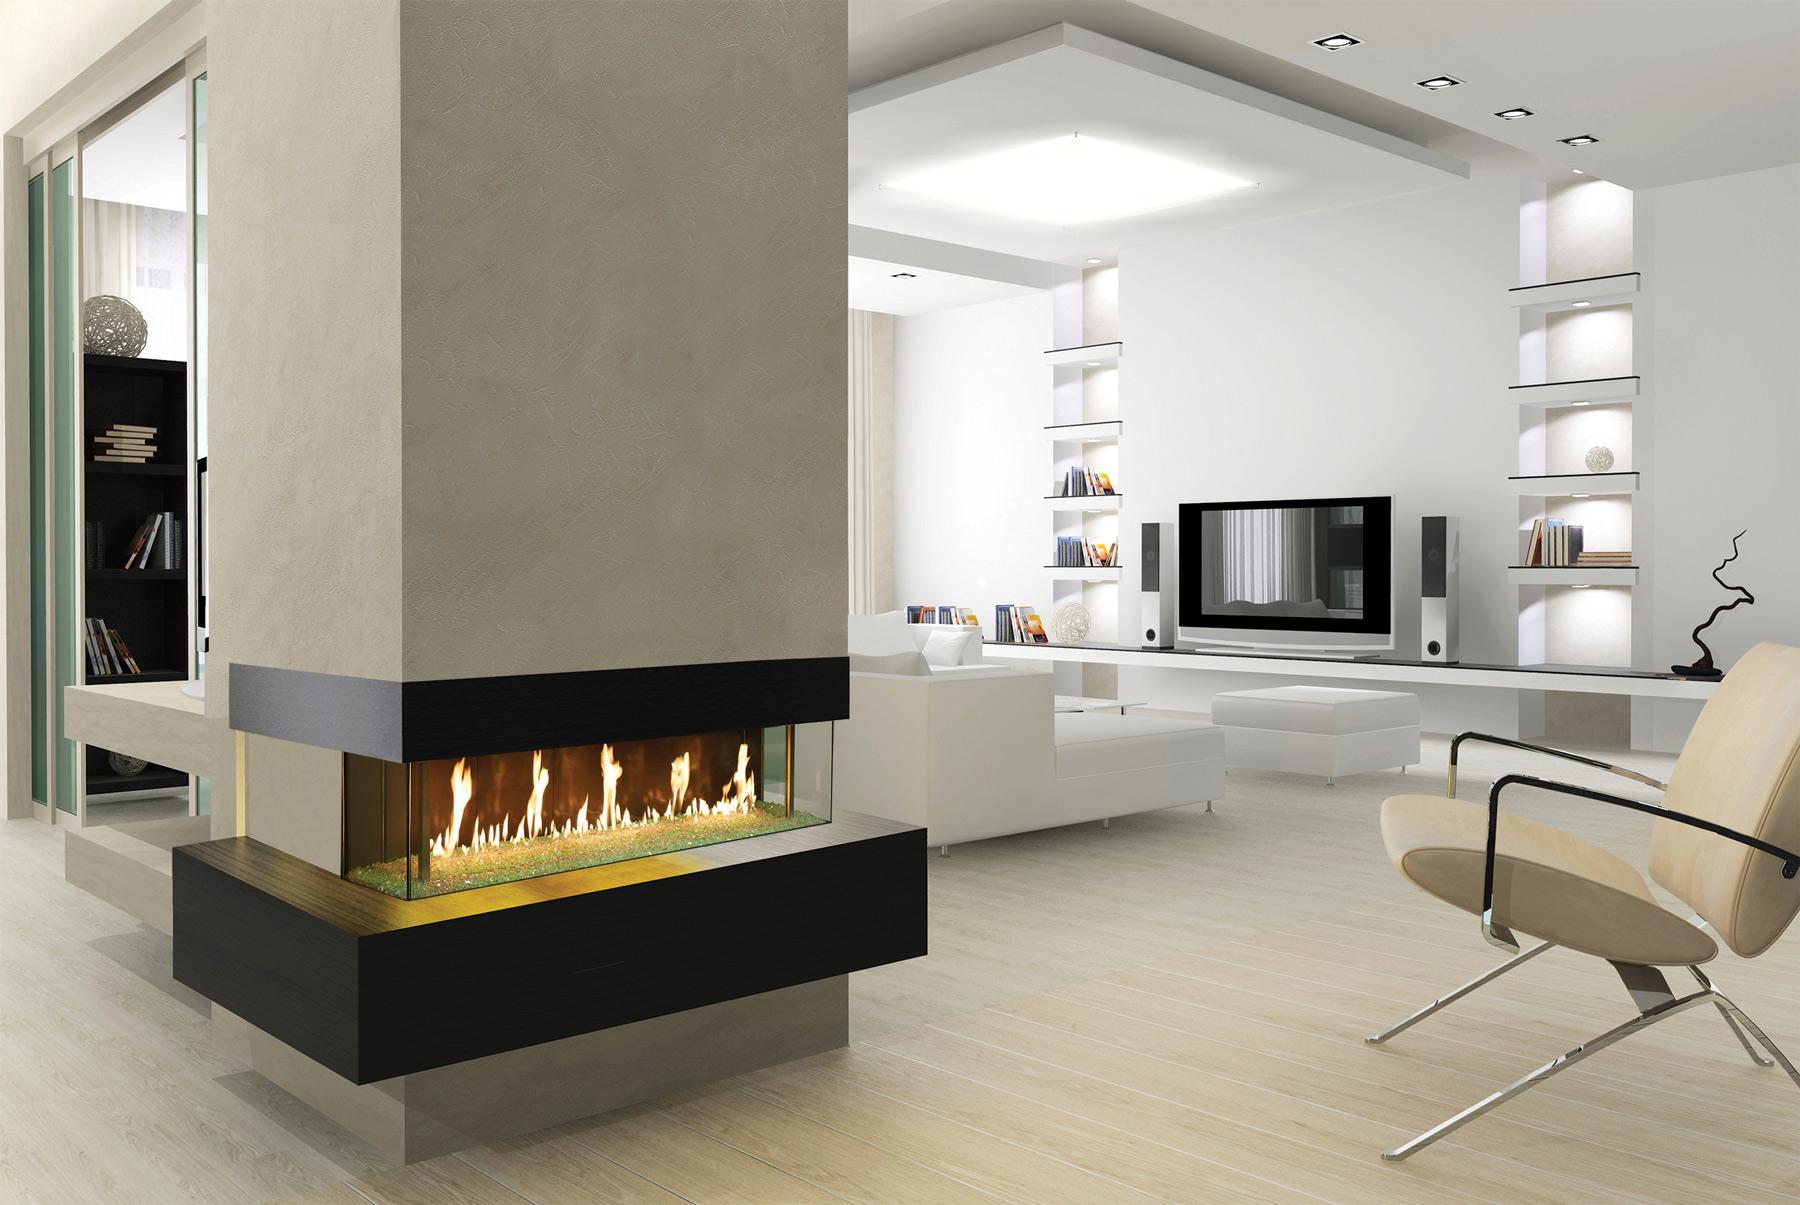 indoor custom fireplace set into wall column